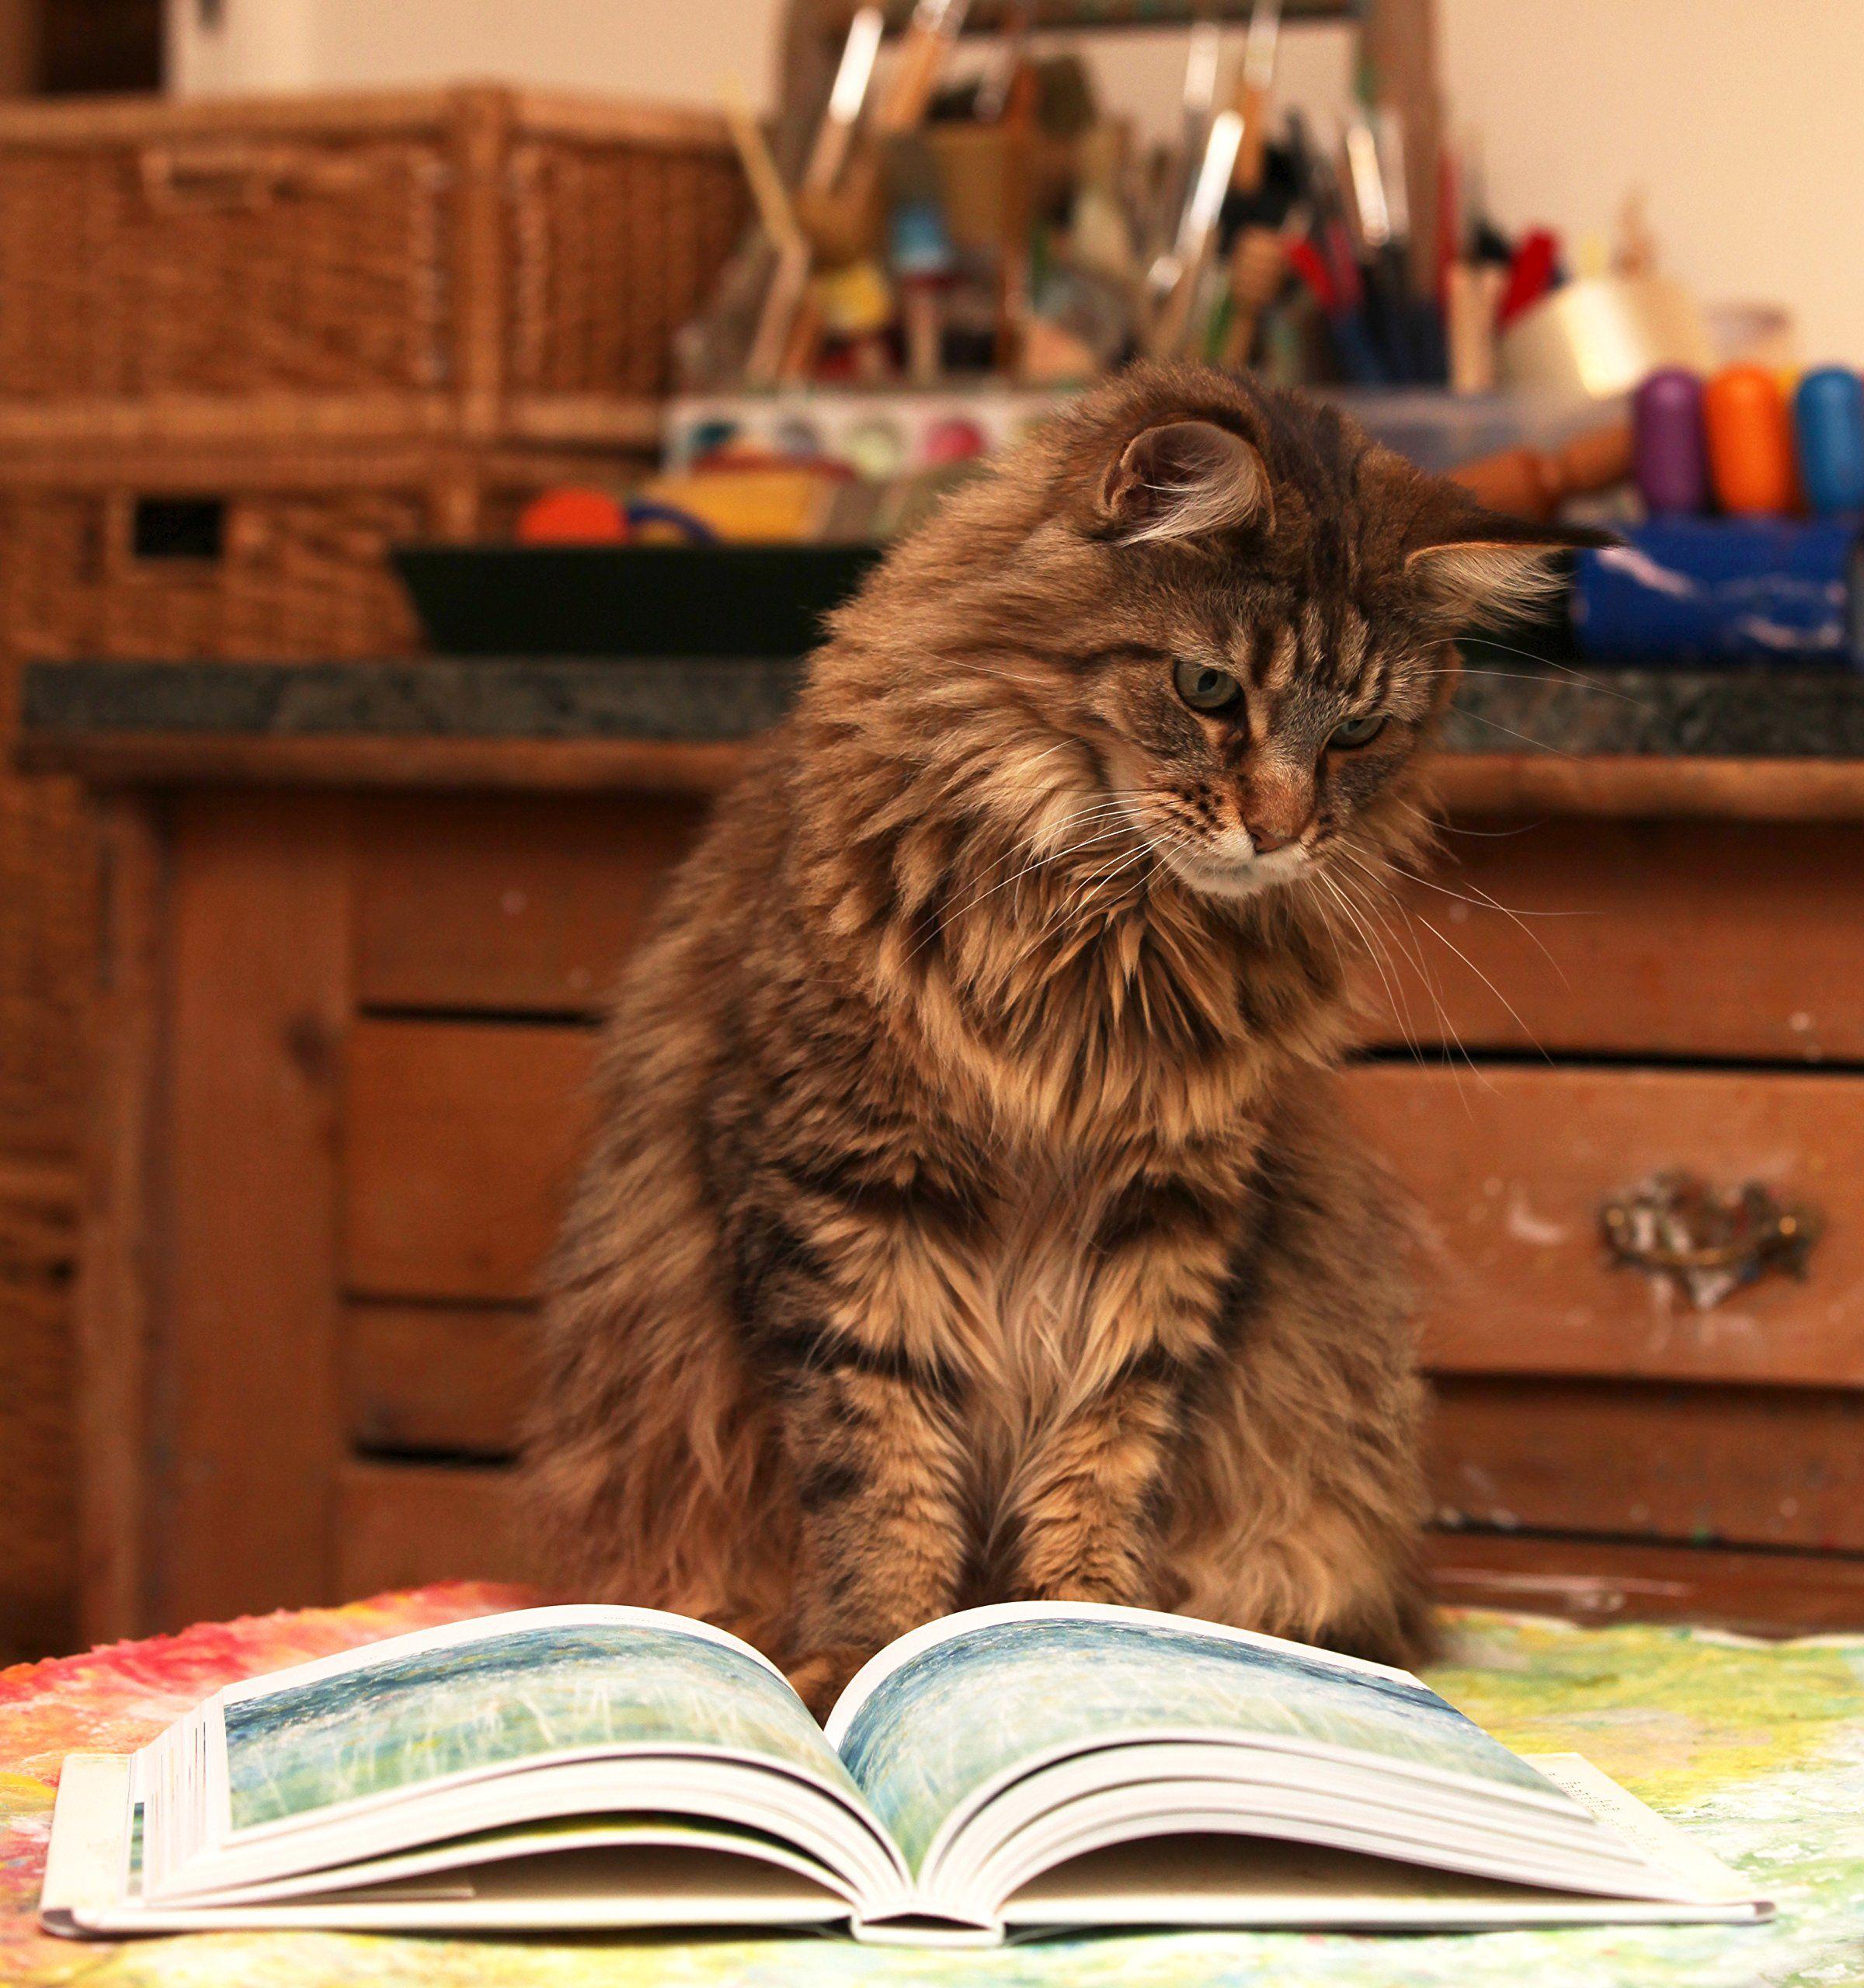 Thula reading Iris Grace: Amazon.co.uk: Arabella Carter-Johnson ...